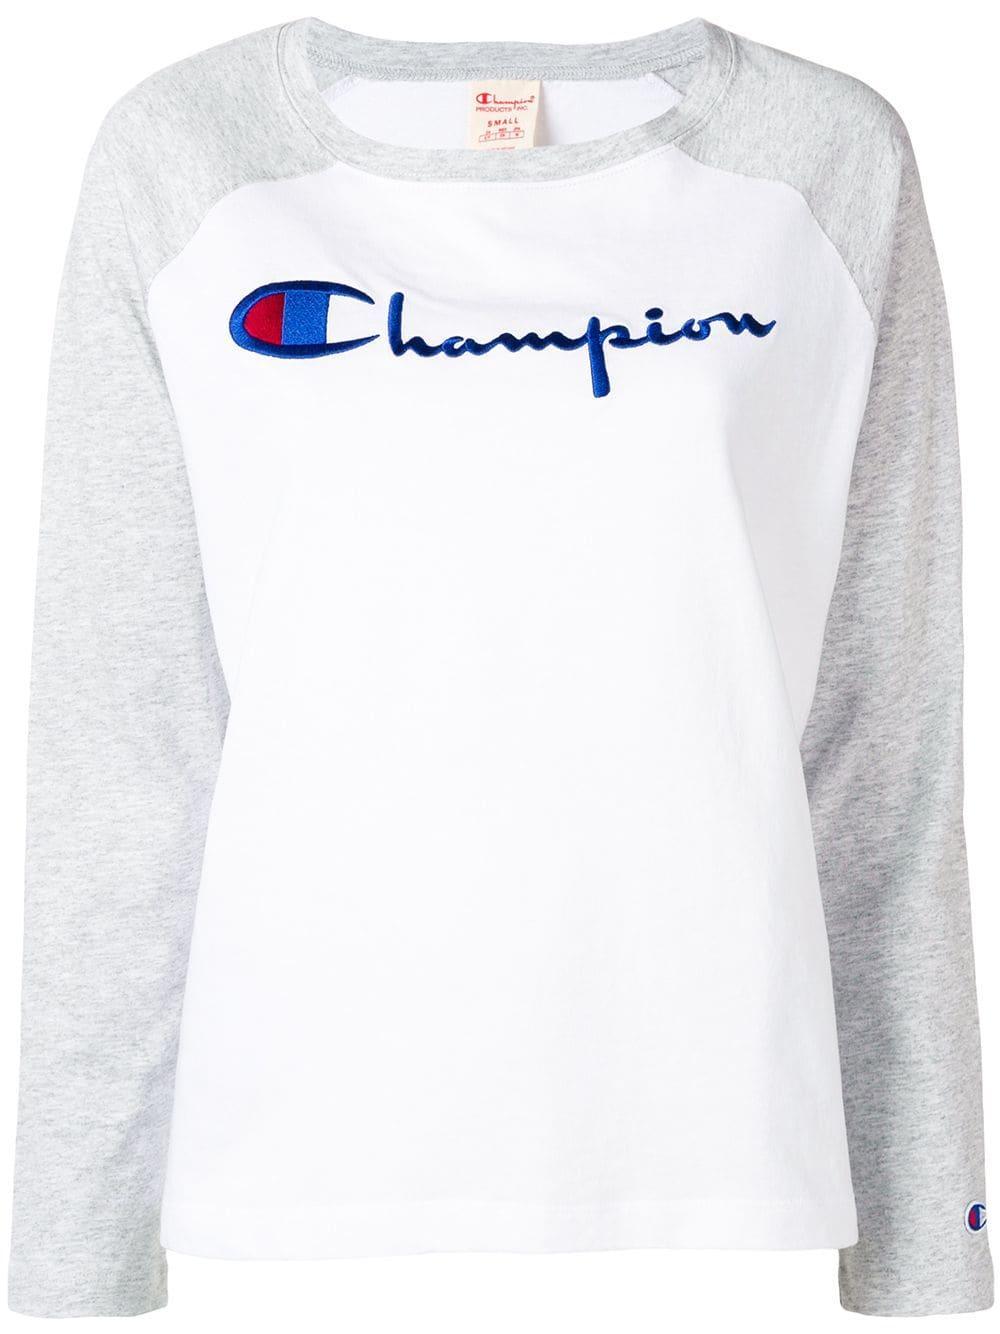 Long Sleeve Cropped Crewneck Tshirt